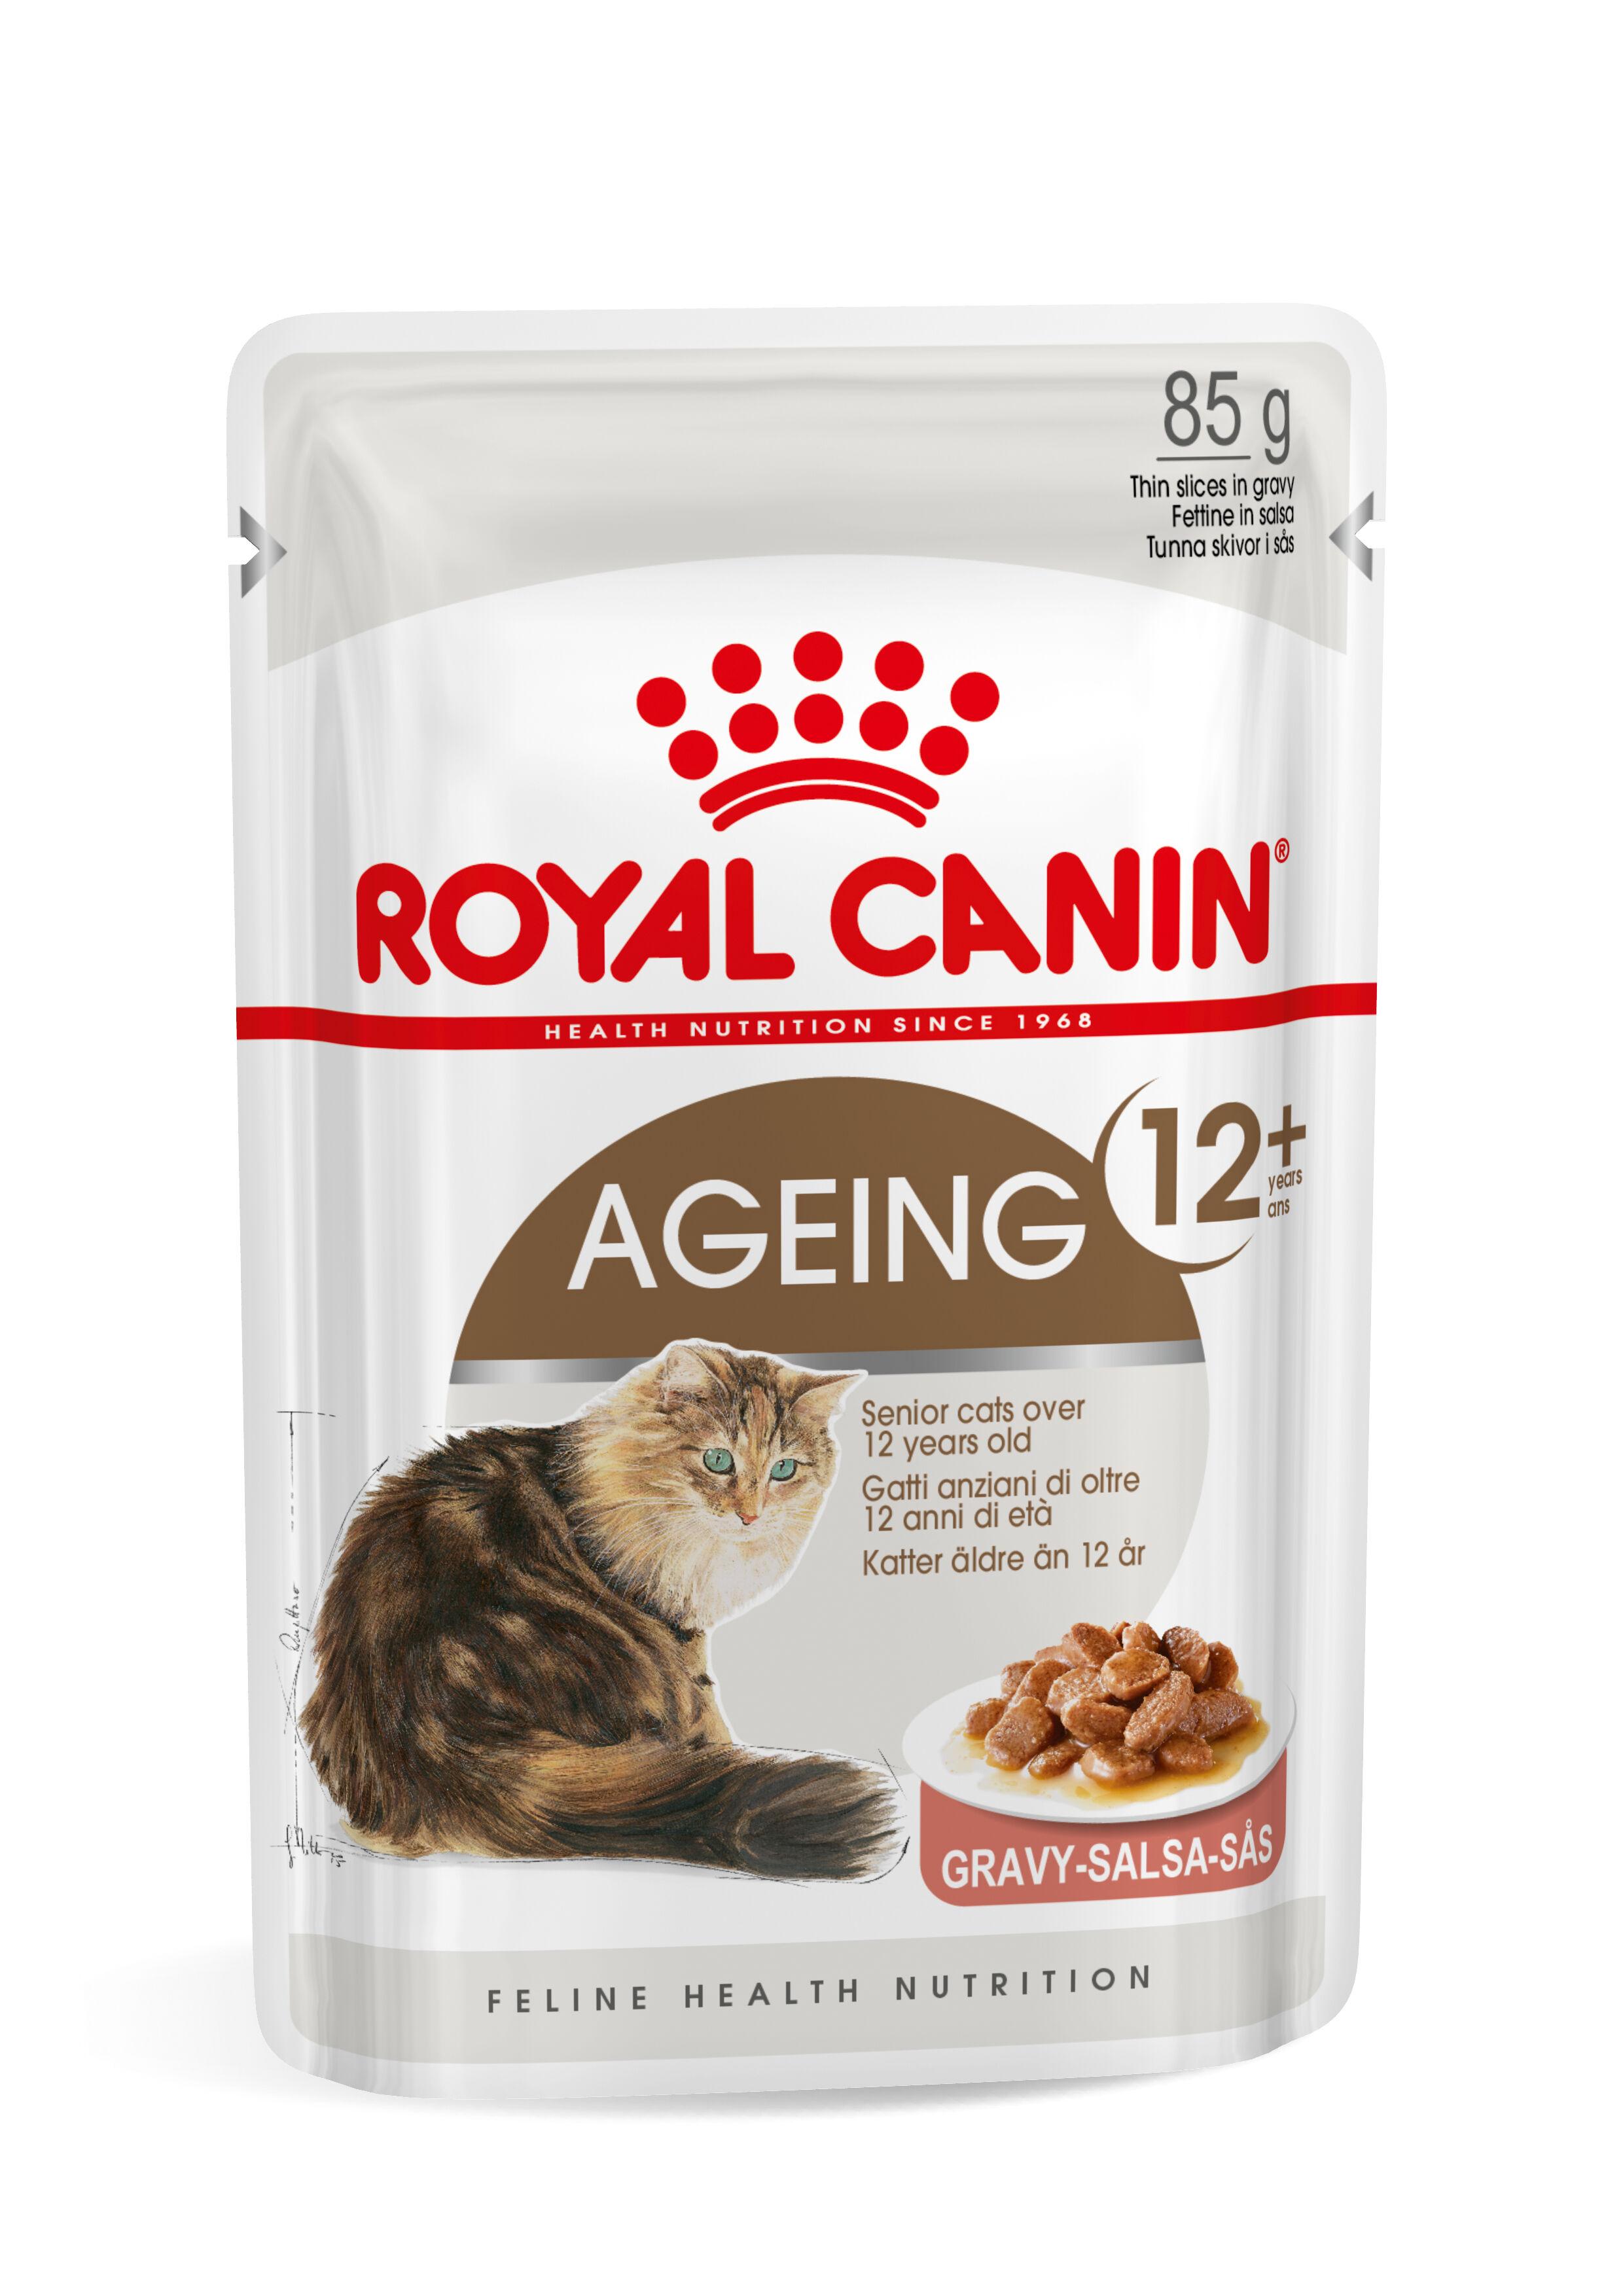 Royal Canin Ageing 12+ pour chat x12 sachets 2x En Sauce (24x85 gr)